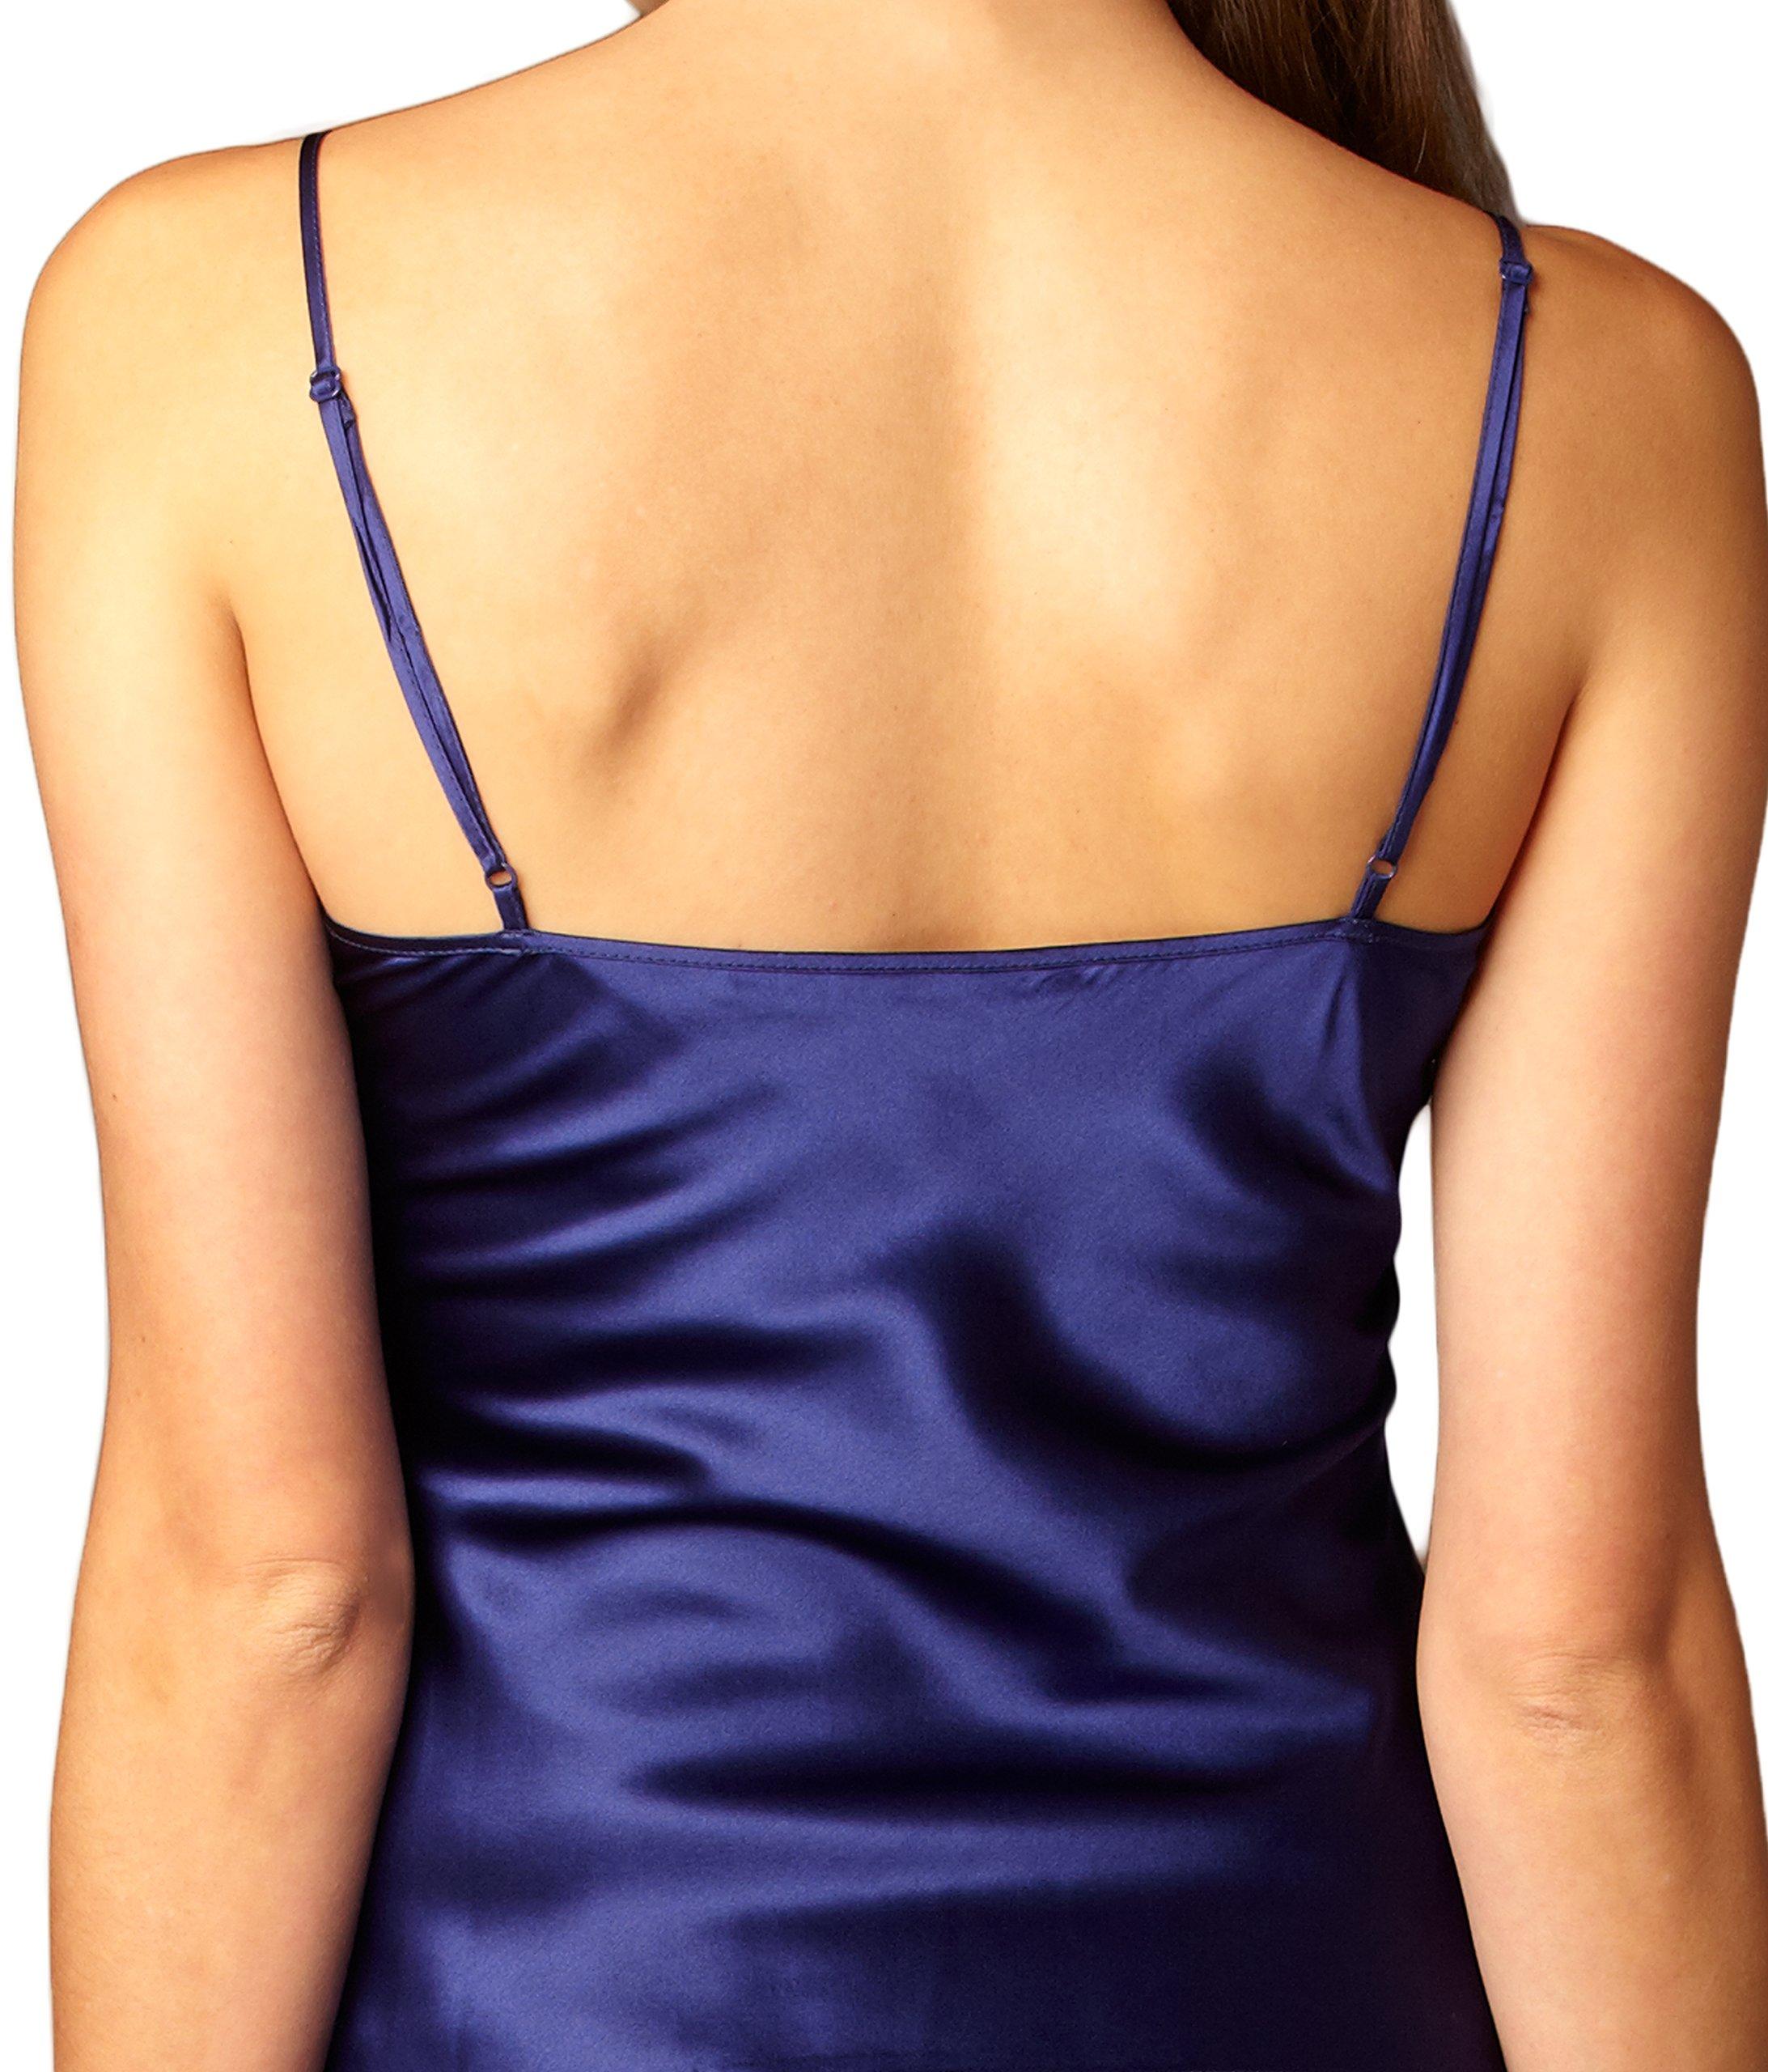 Julianna Rae Women's 100% Silk Contrast Cami Top, Lace Trim, Flattering Fit, Le Tresor Collection, Parisian, M by Julianna Rae (Image #3)